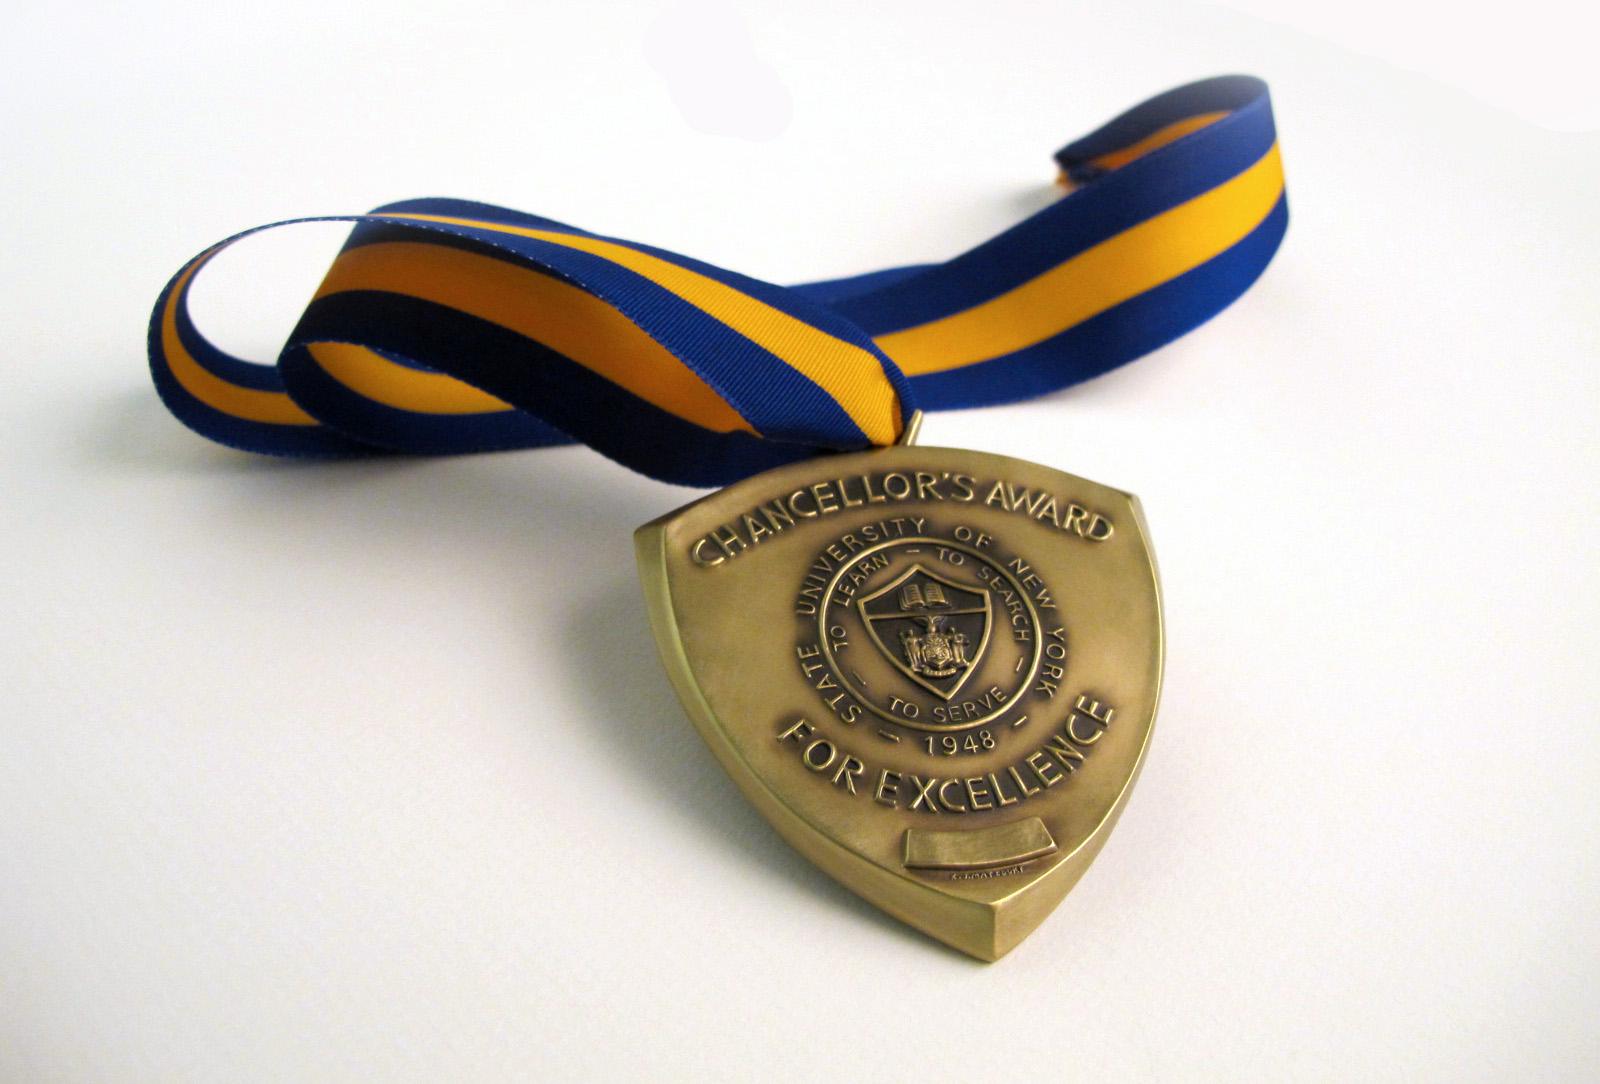 1428001785 chancel award metal